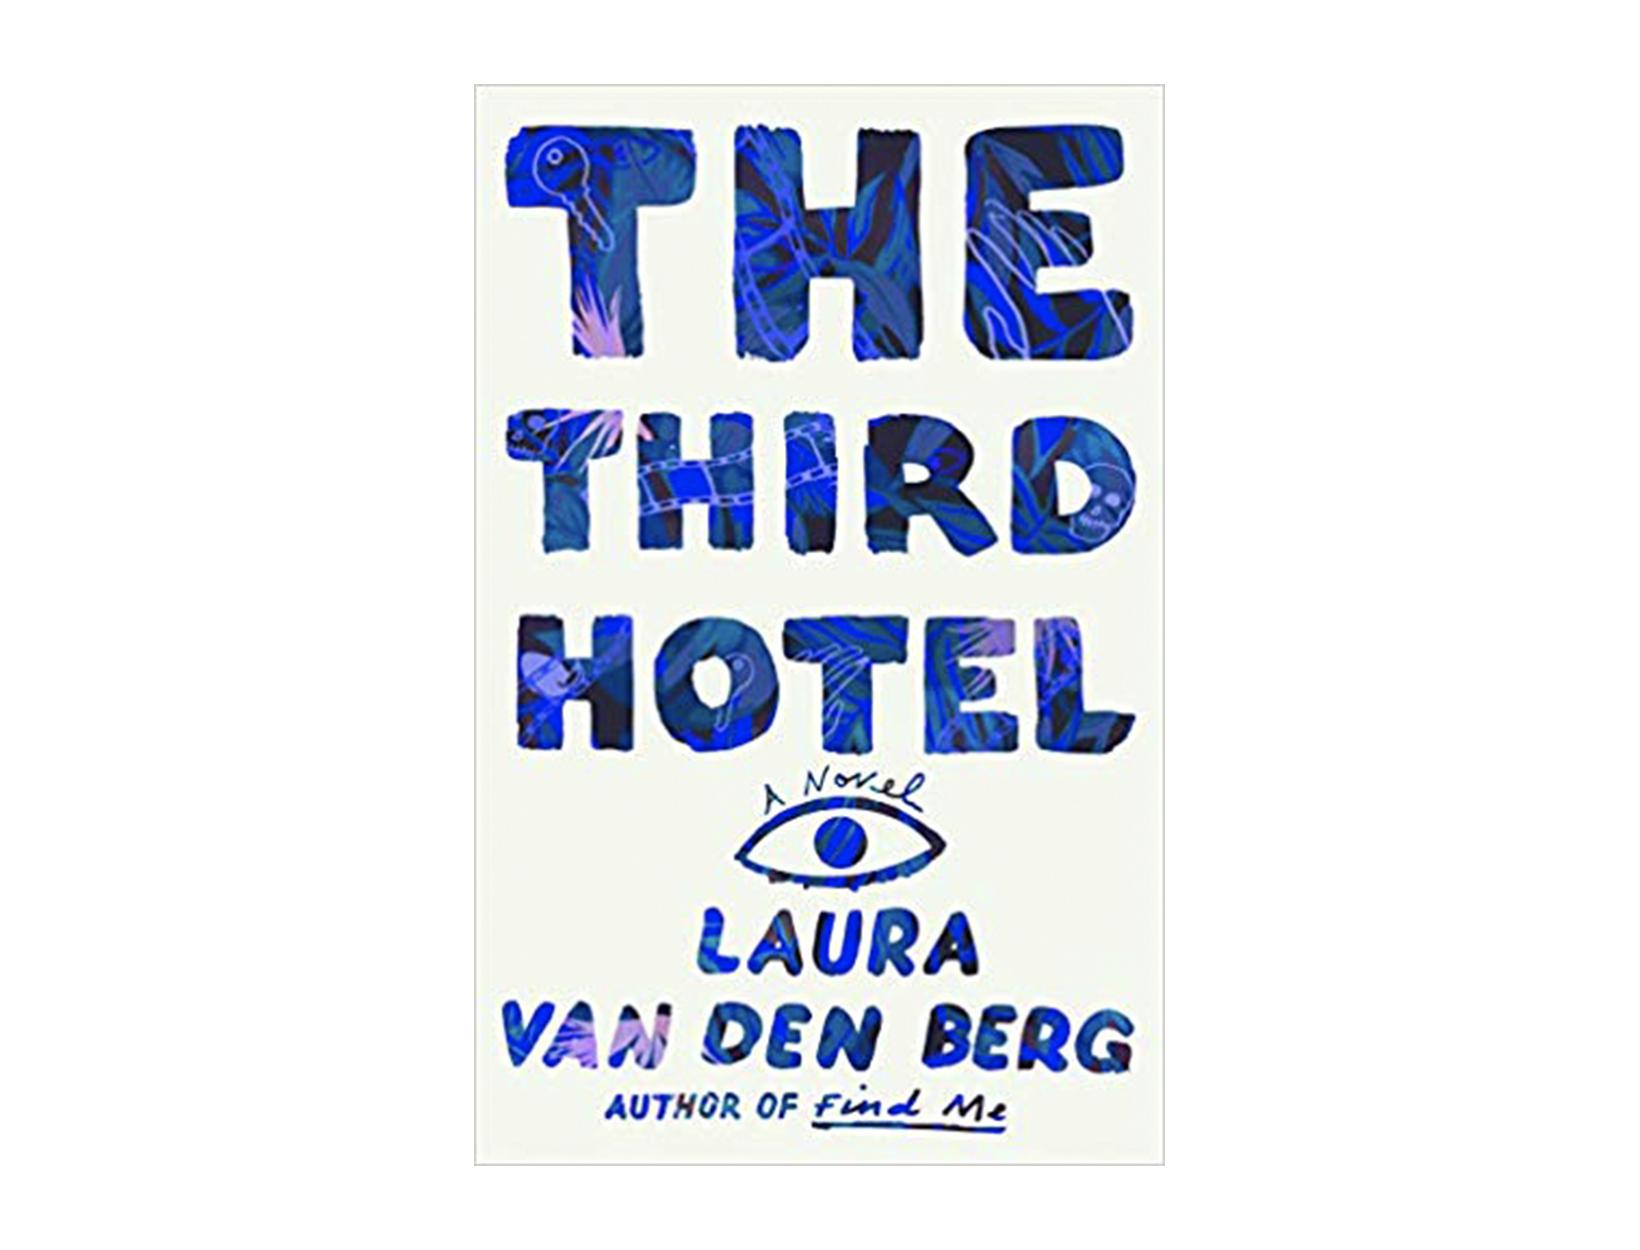 <em>The Third Hotel</em> by Laura van den Berg